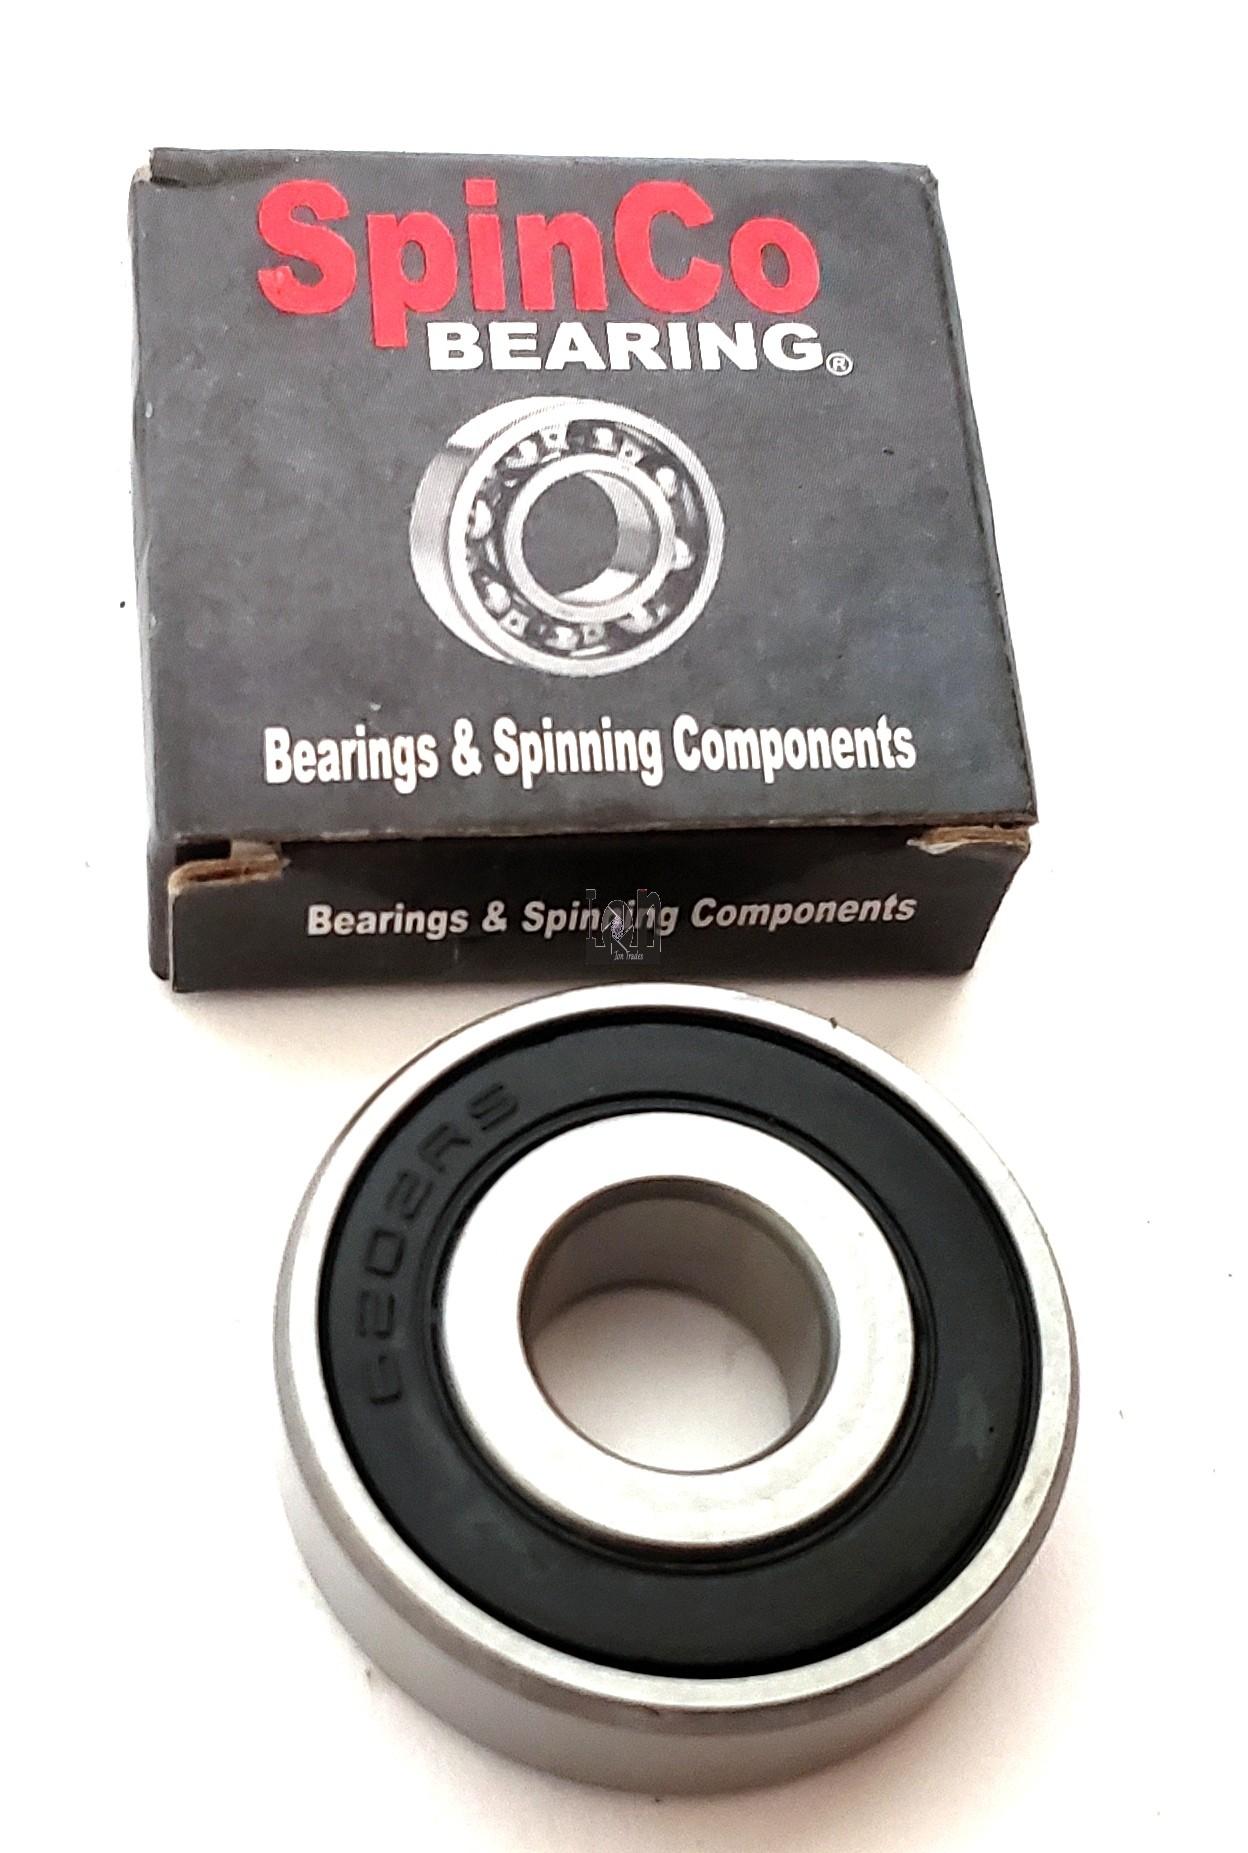 "6202-2RS 1/2"" Bearings 1/2"" x 1-3/8"" x 0.43"" Sealed Ball Bearing"